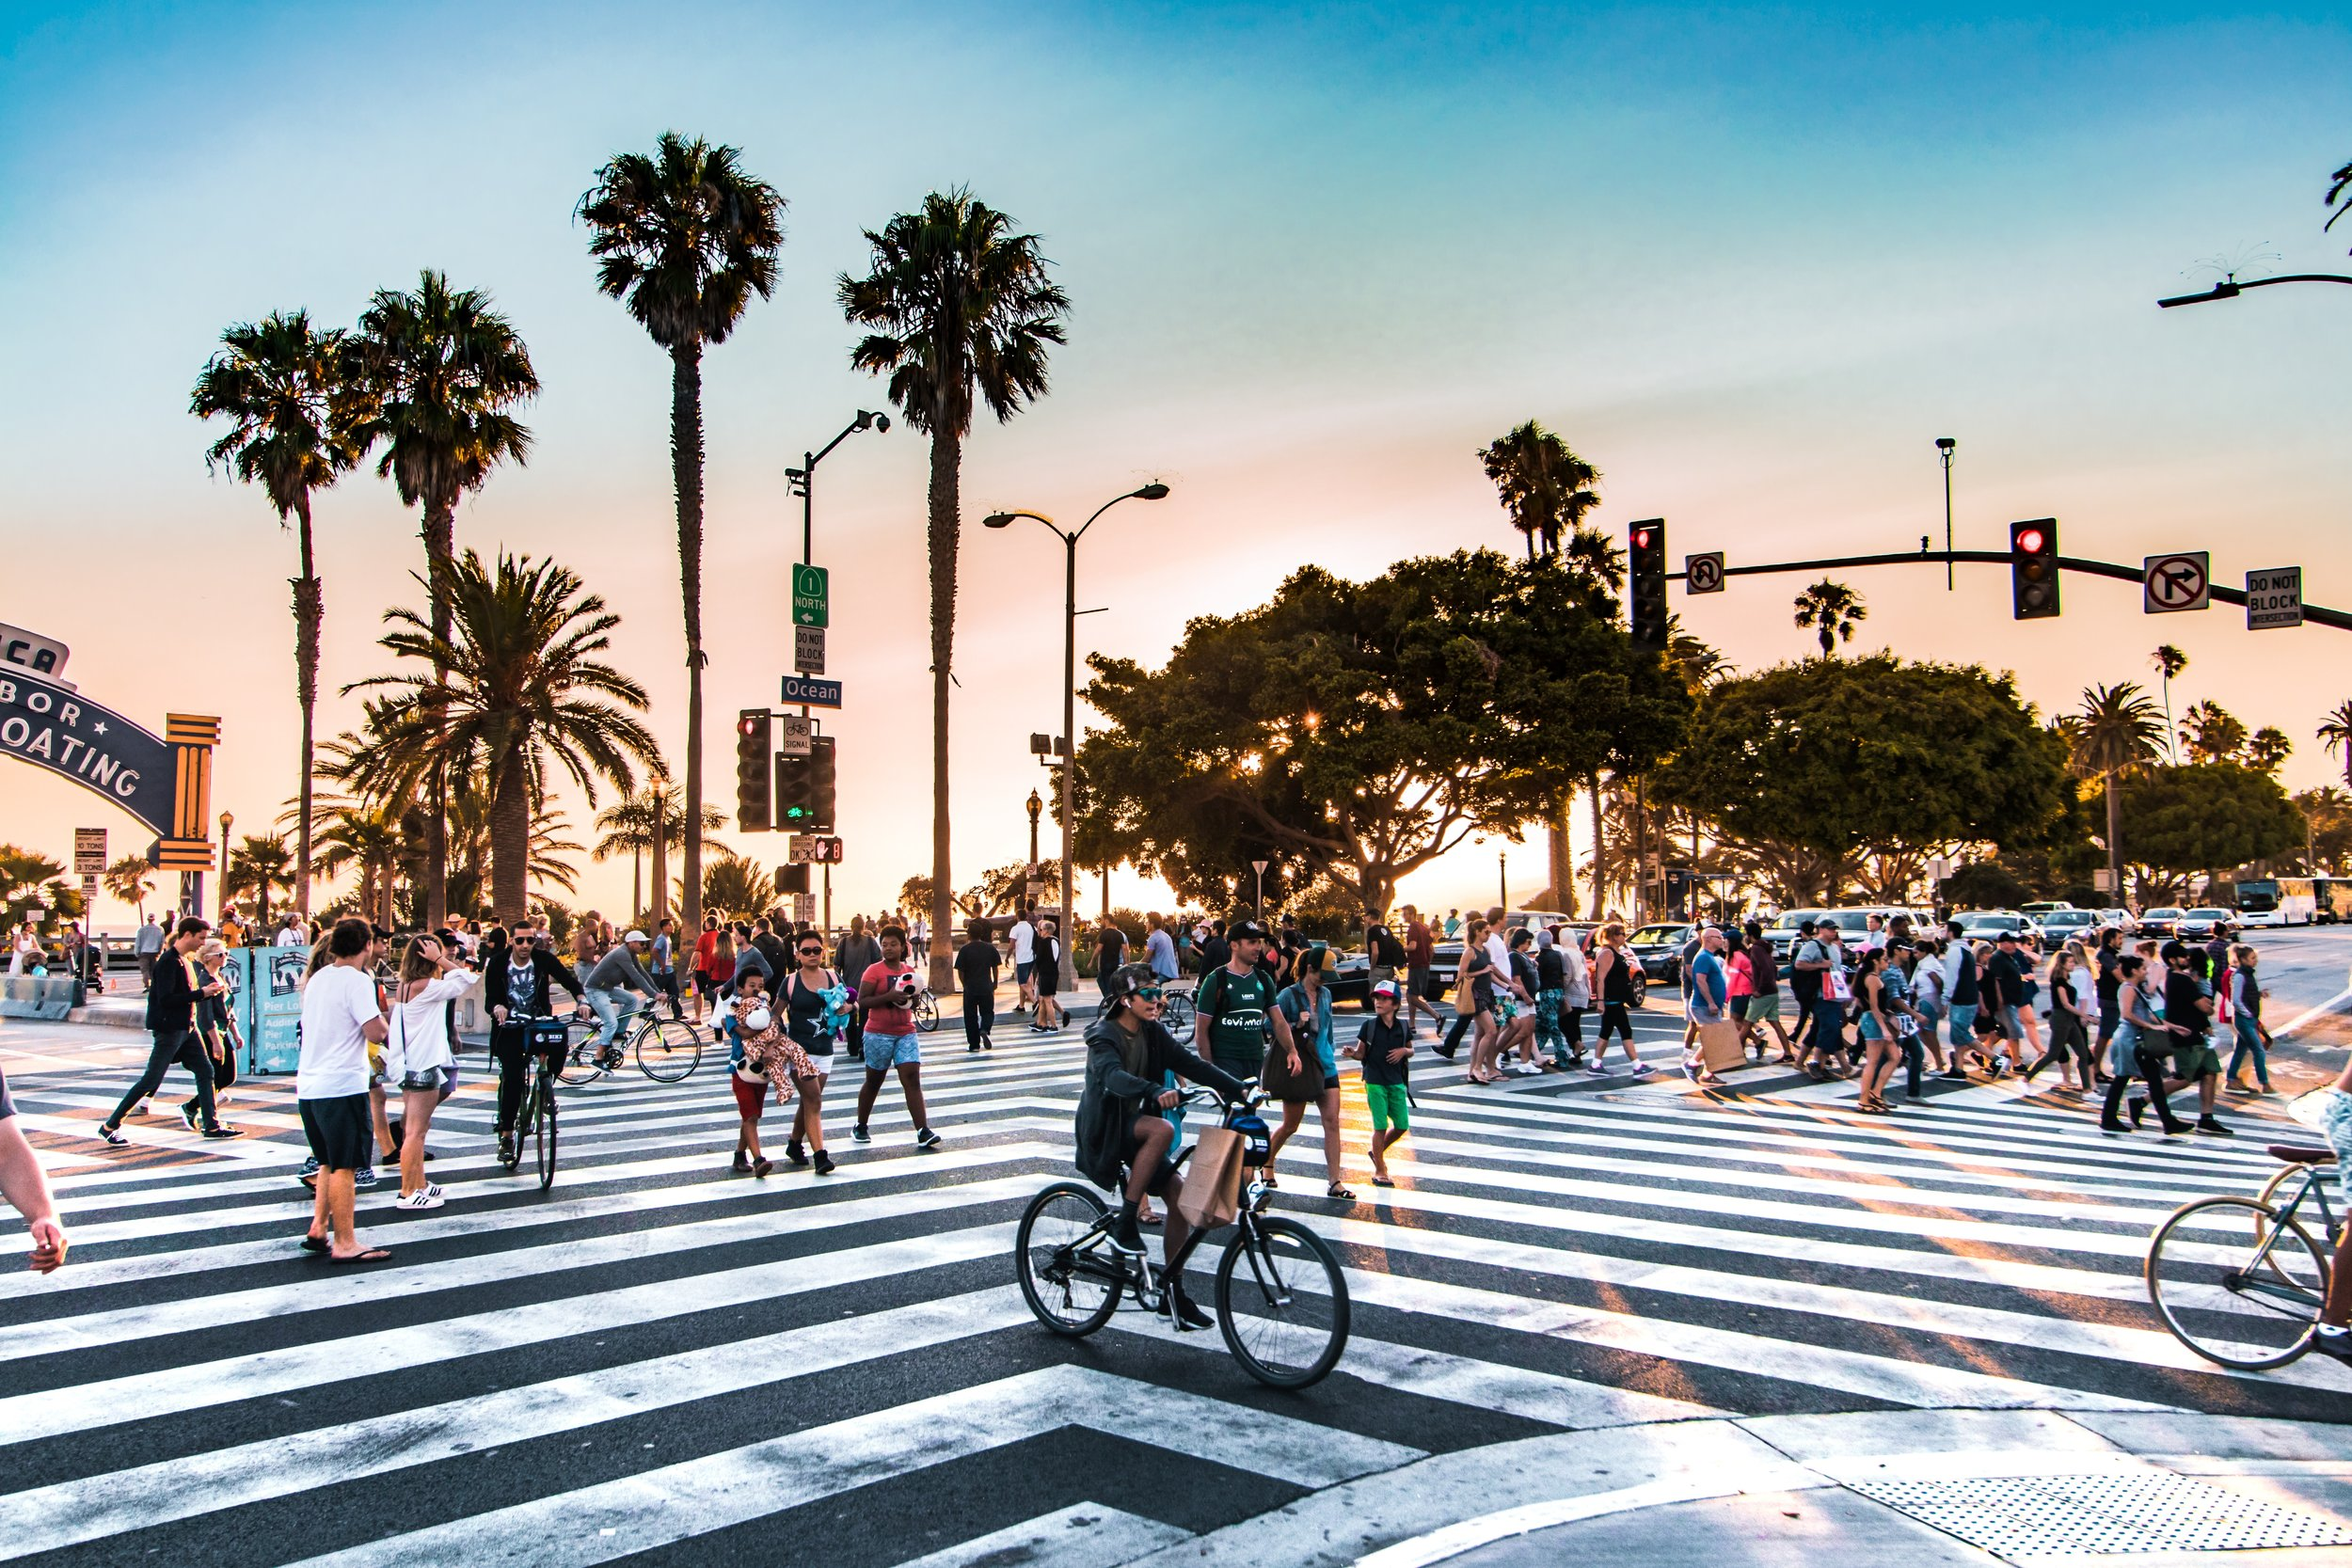 Los Angeles Busy Streets | Team Building in Los Angeles.jpg